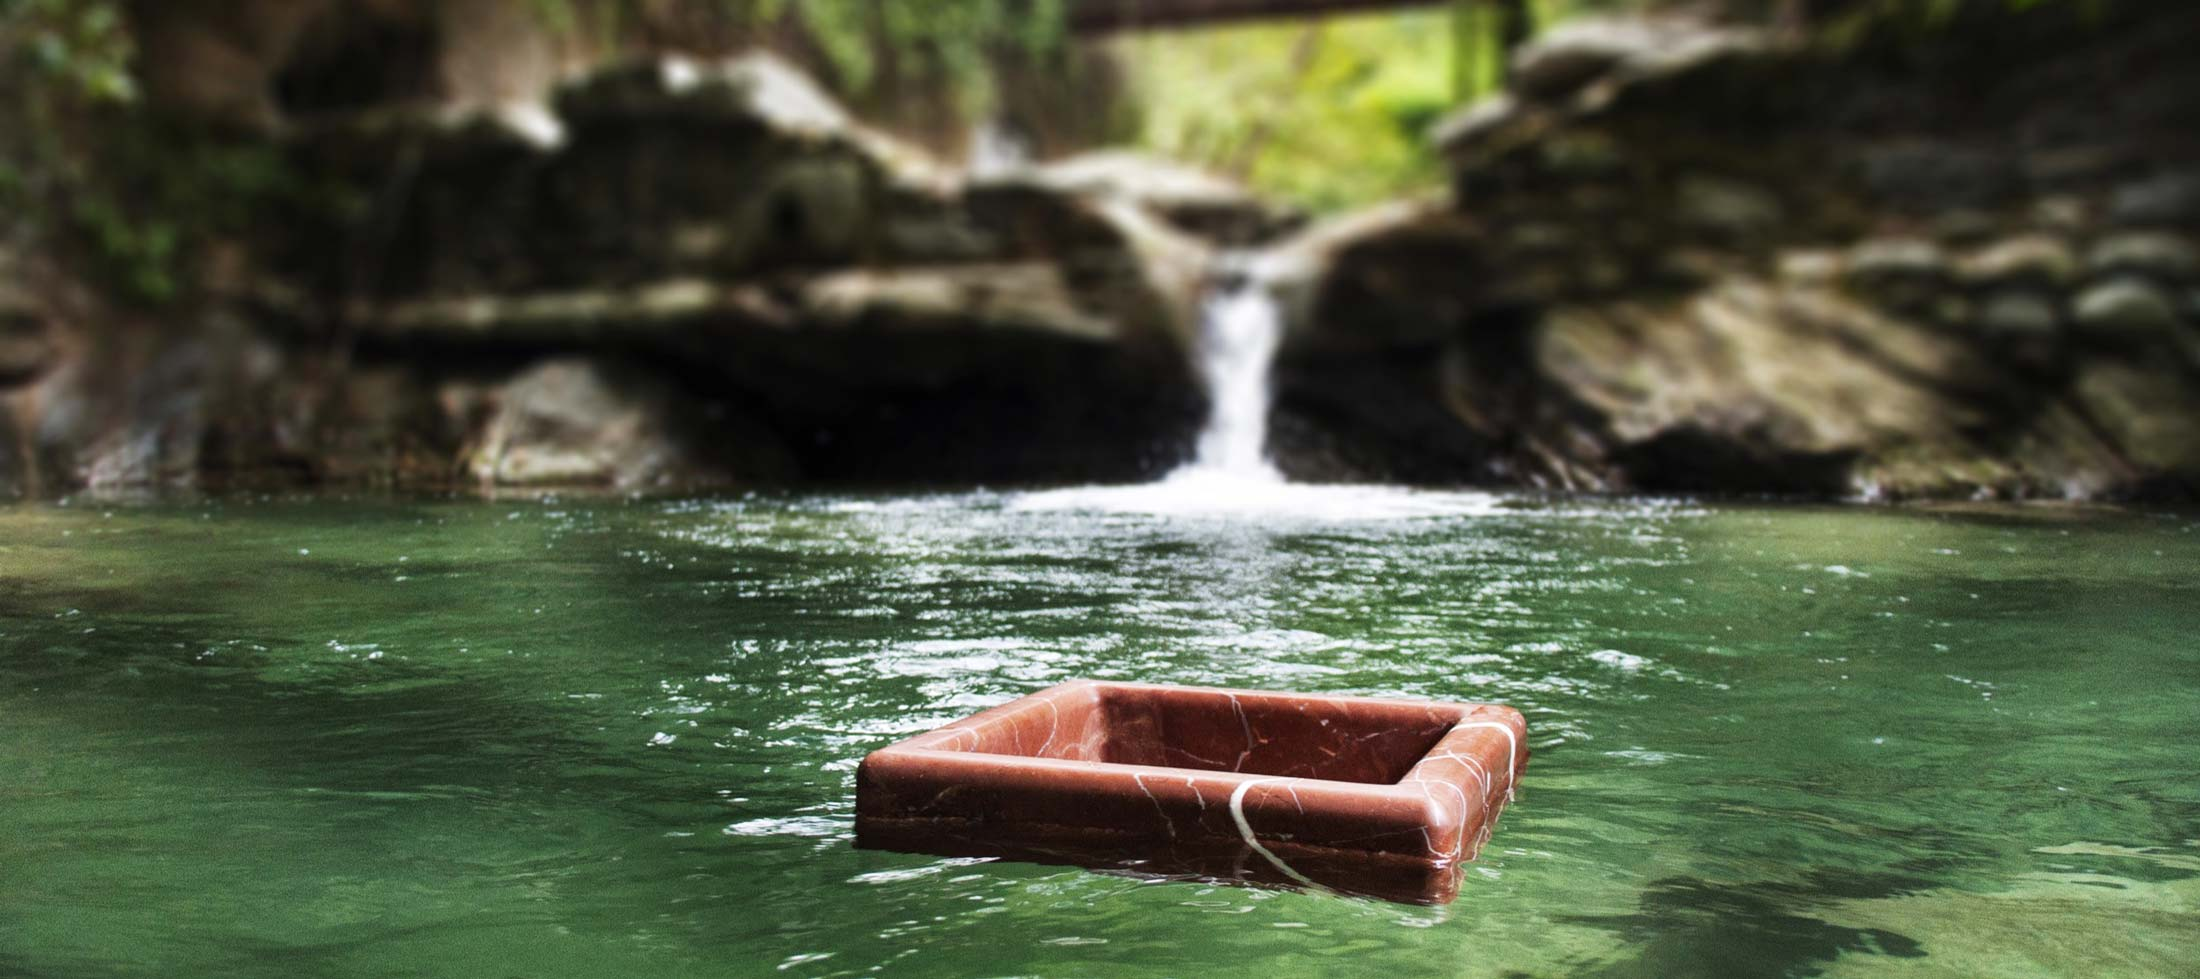 https://www.dedalostone.com/wp-content/uploads/2018/03/lavabo-in-marmo-leggero-galleggiante.jpg